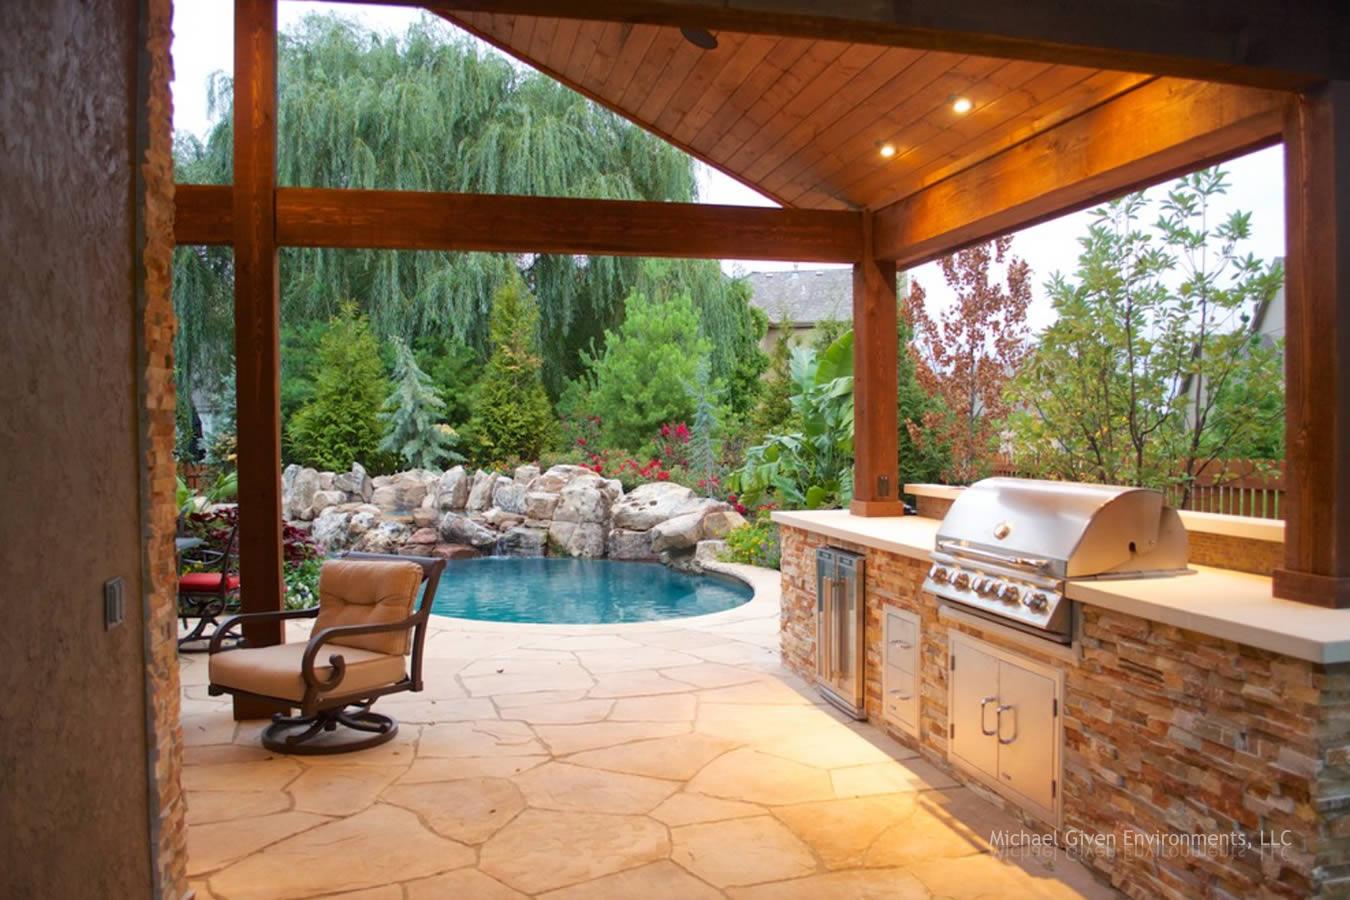 Design Backyard Oasis backyard oasis gallery by michael given environments llc kansas oasis